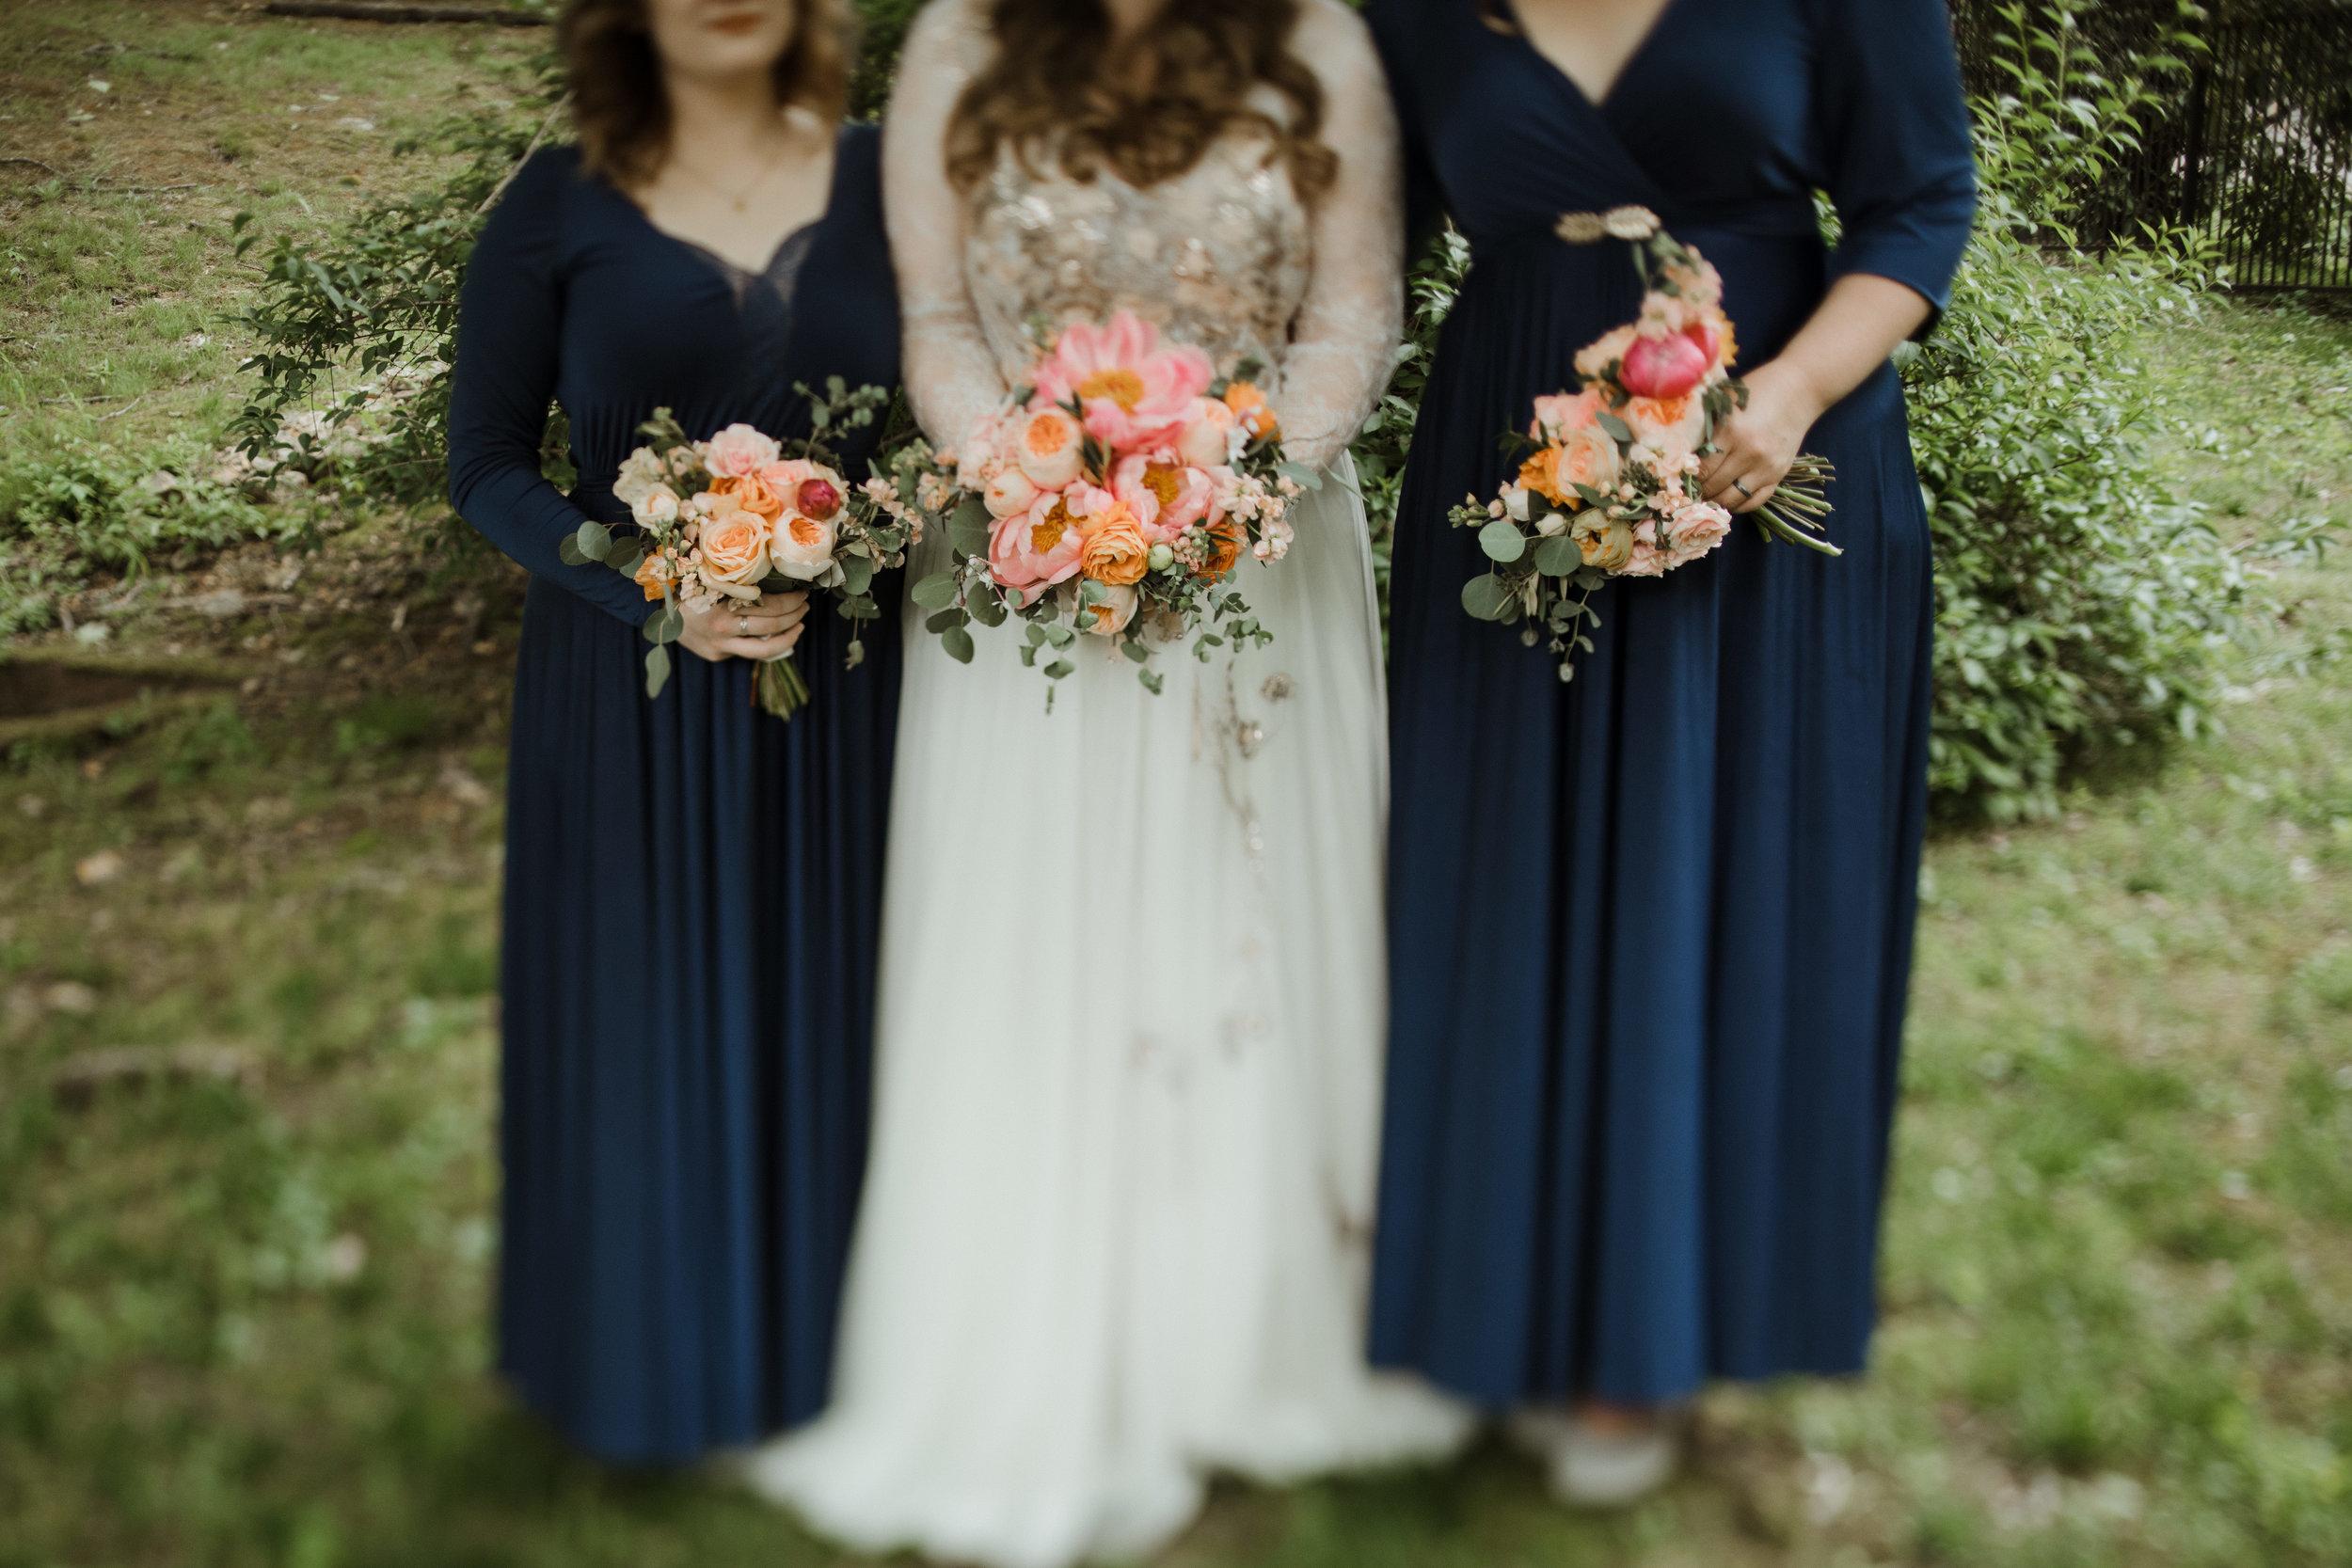 Elizabeth and Aldens Intimate Backyard wedding in Nashville Tennessee Wedding Photographer00009.jpg